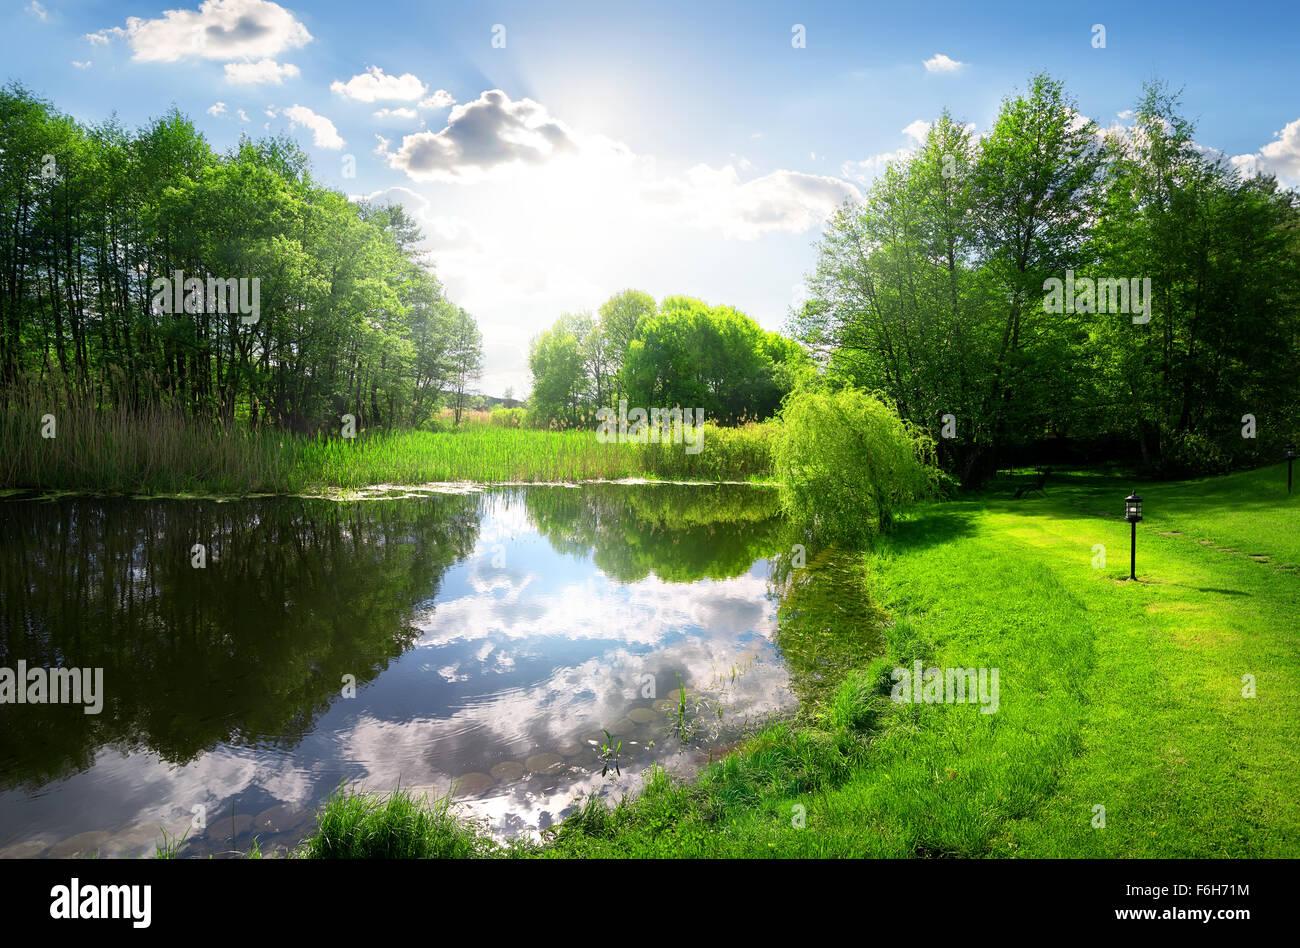 Green park near calm river under sunlight Stock Photo